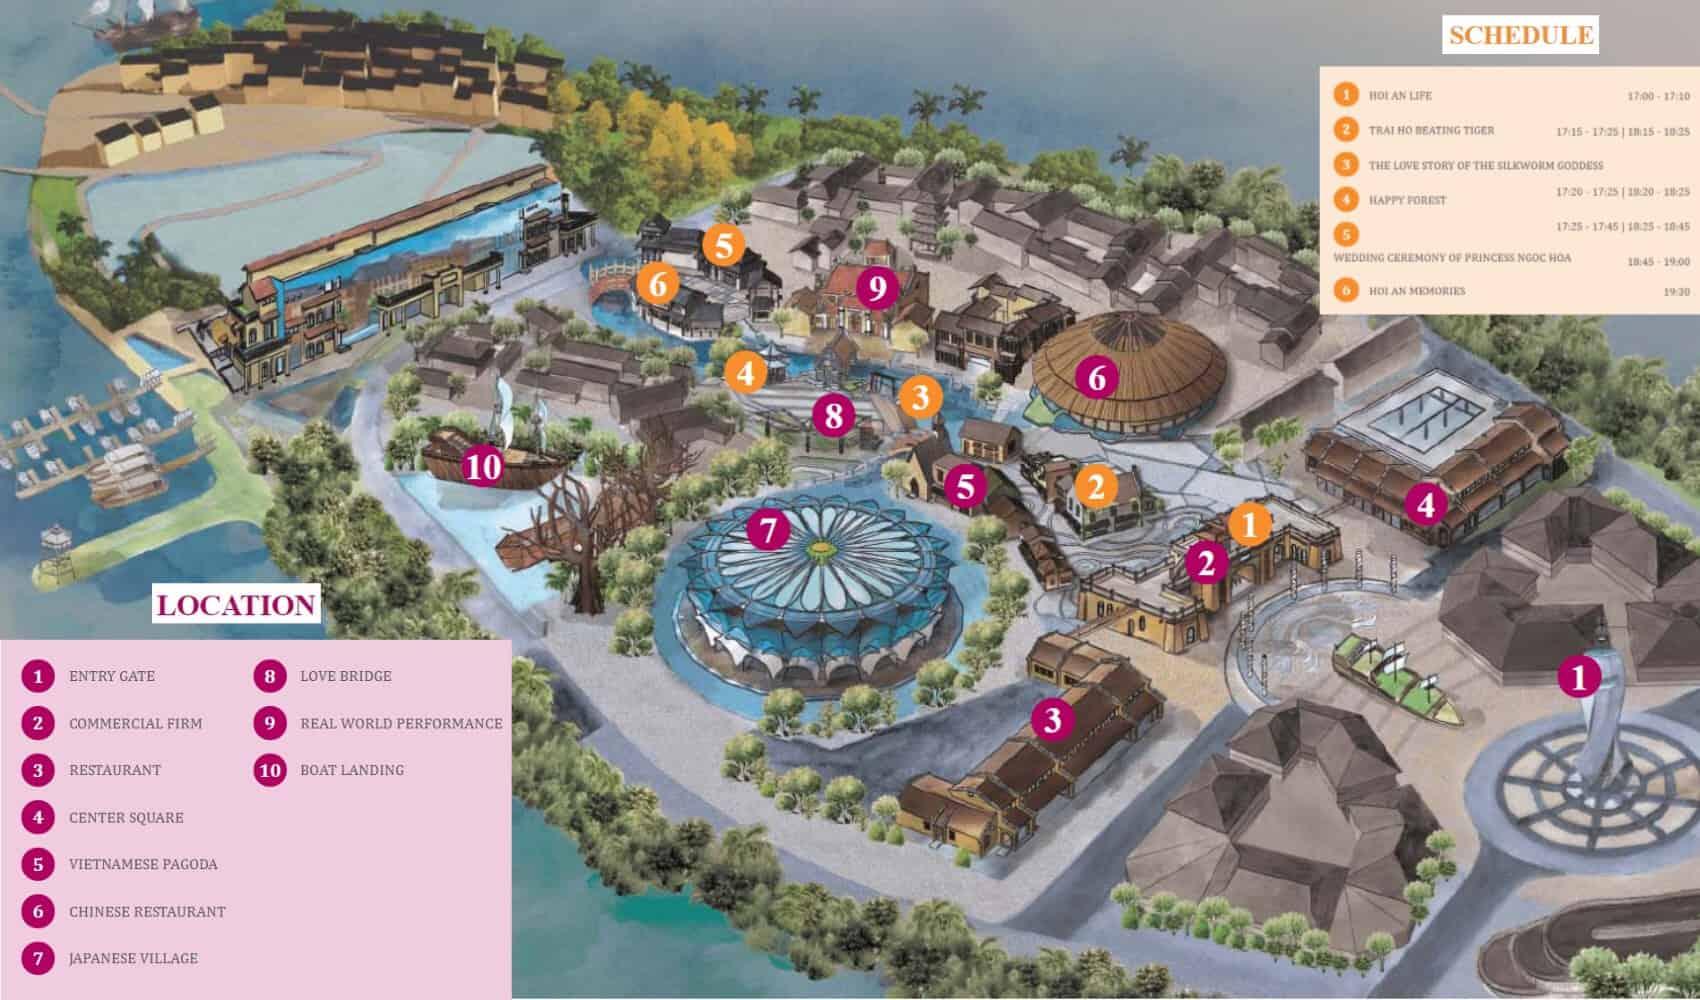 hoi an impression theme park map